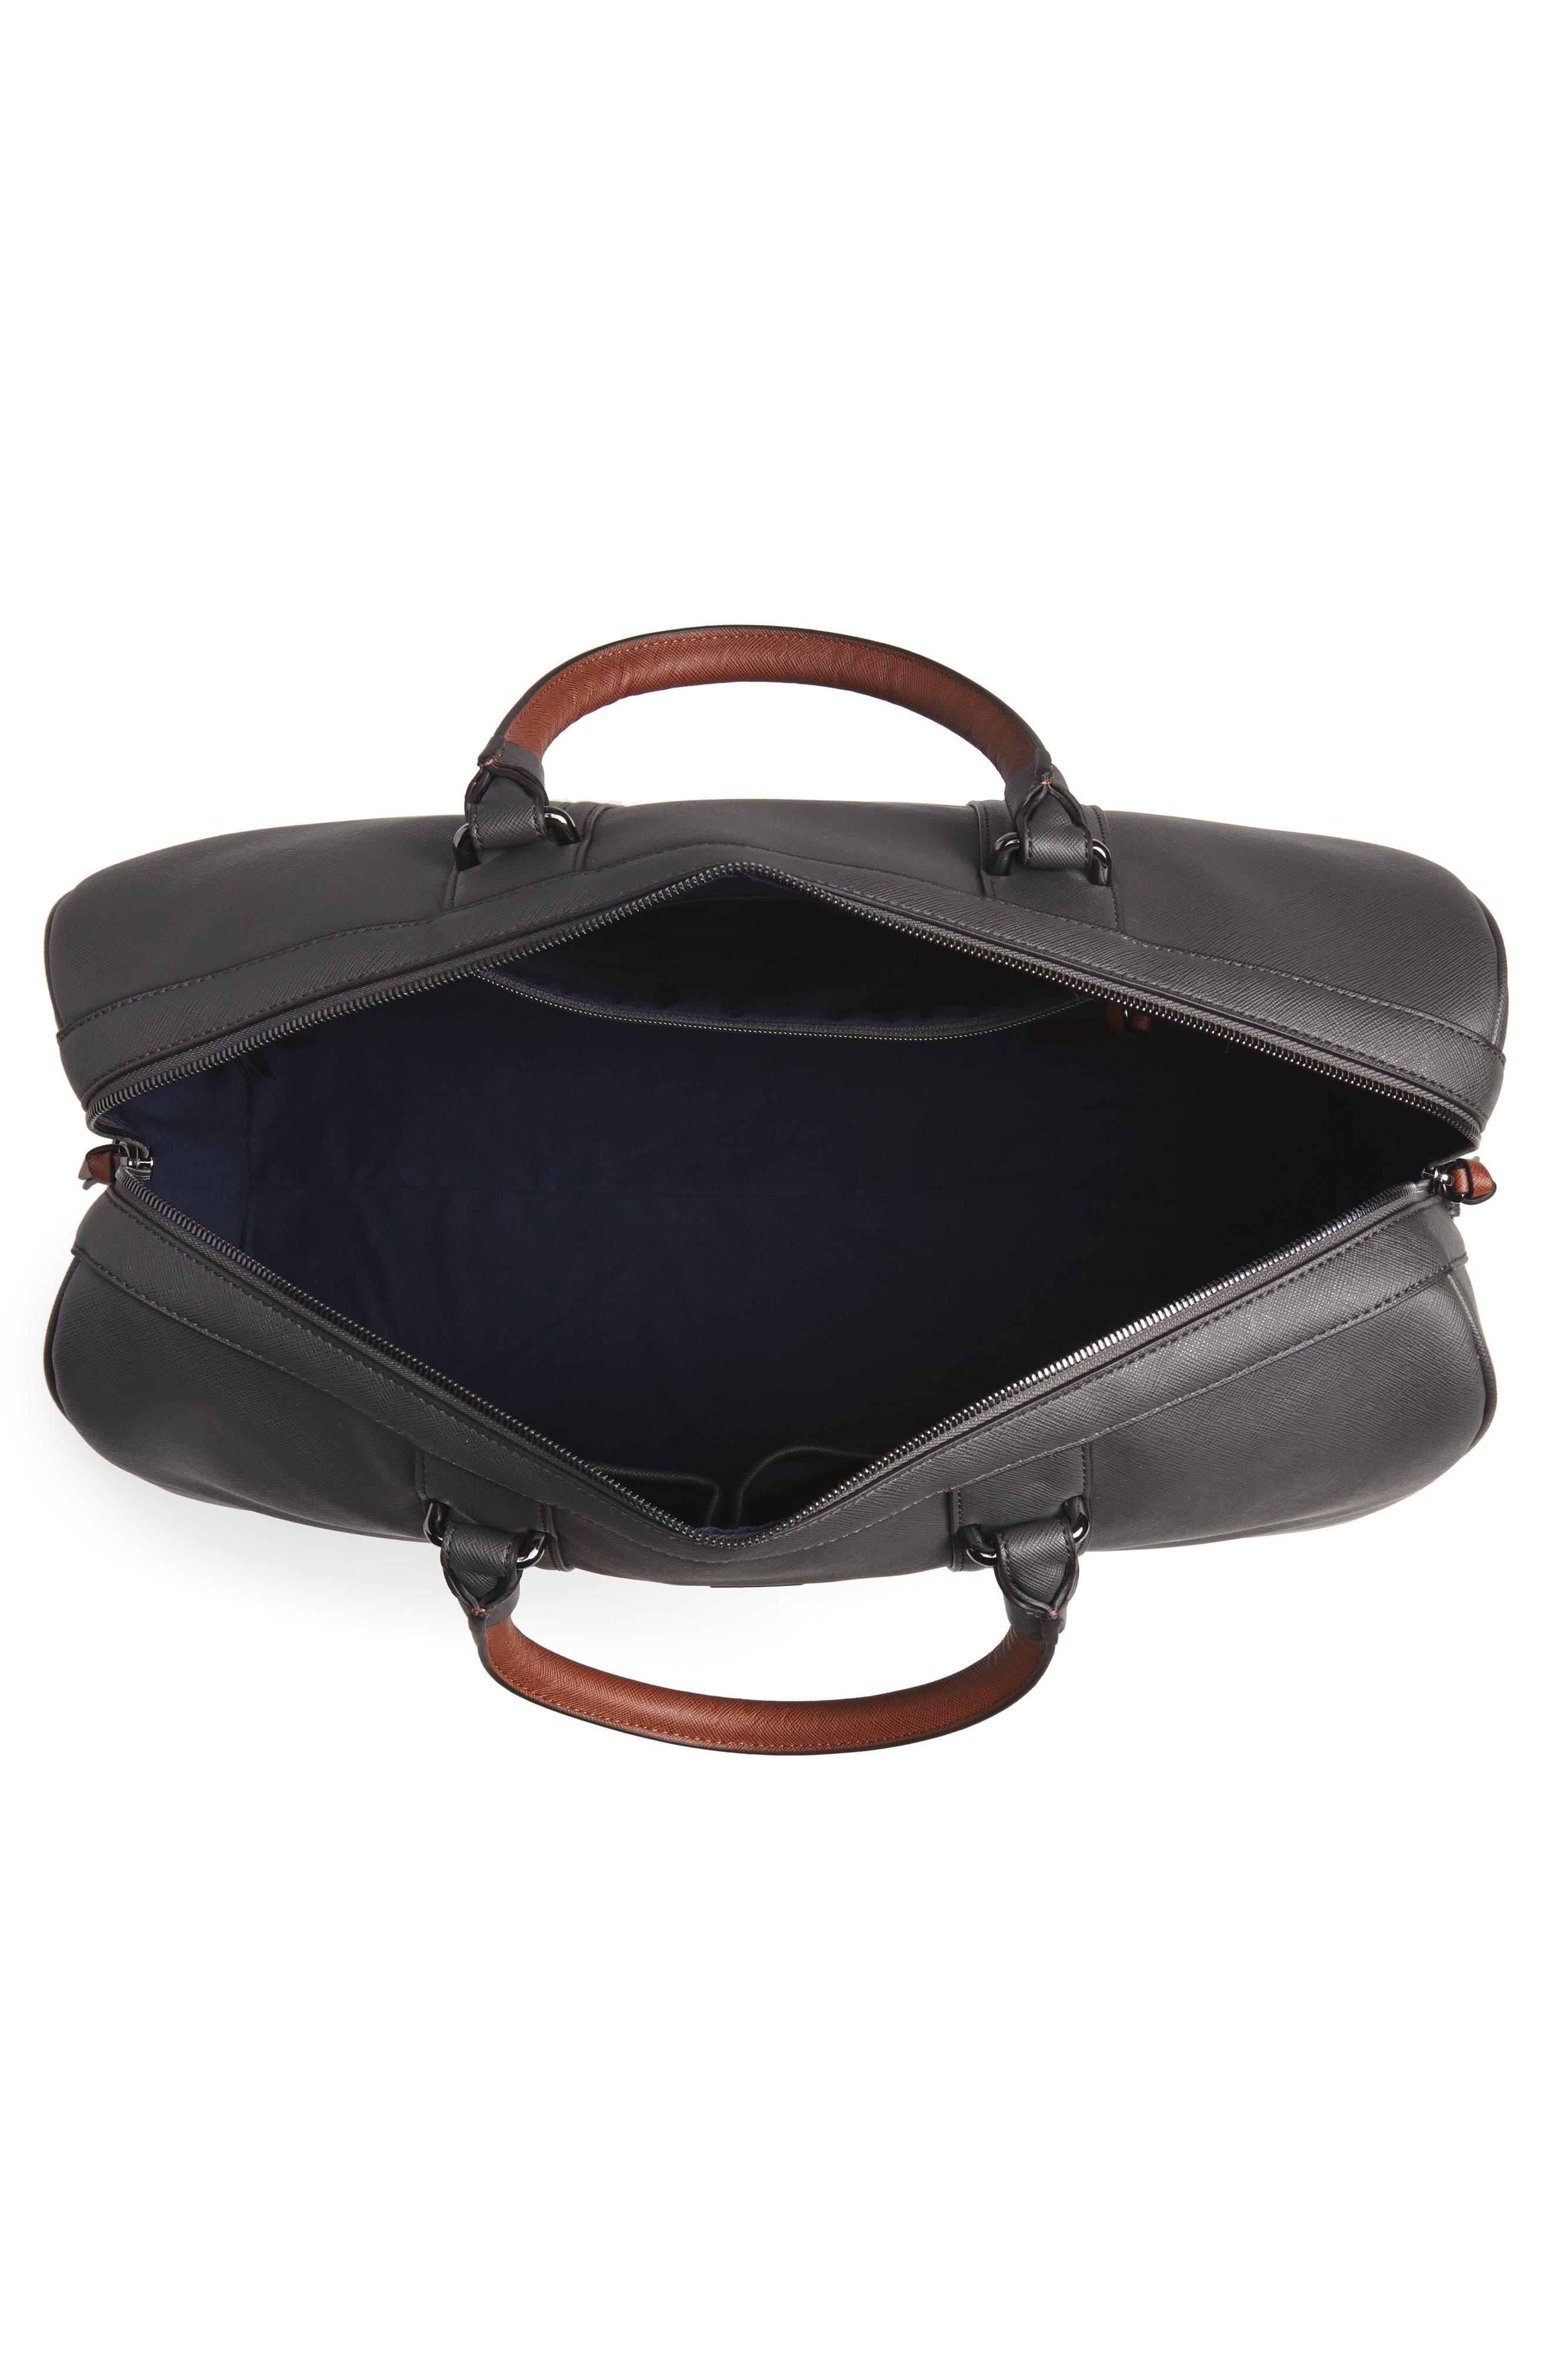 Grankan Faux Leather Duffel Bag,                             Alternate thumbnail 4, color,                             CHARCOAL